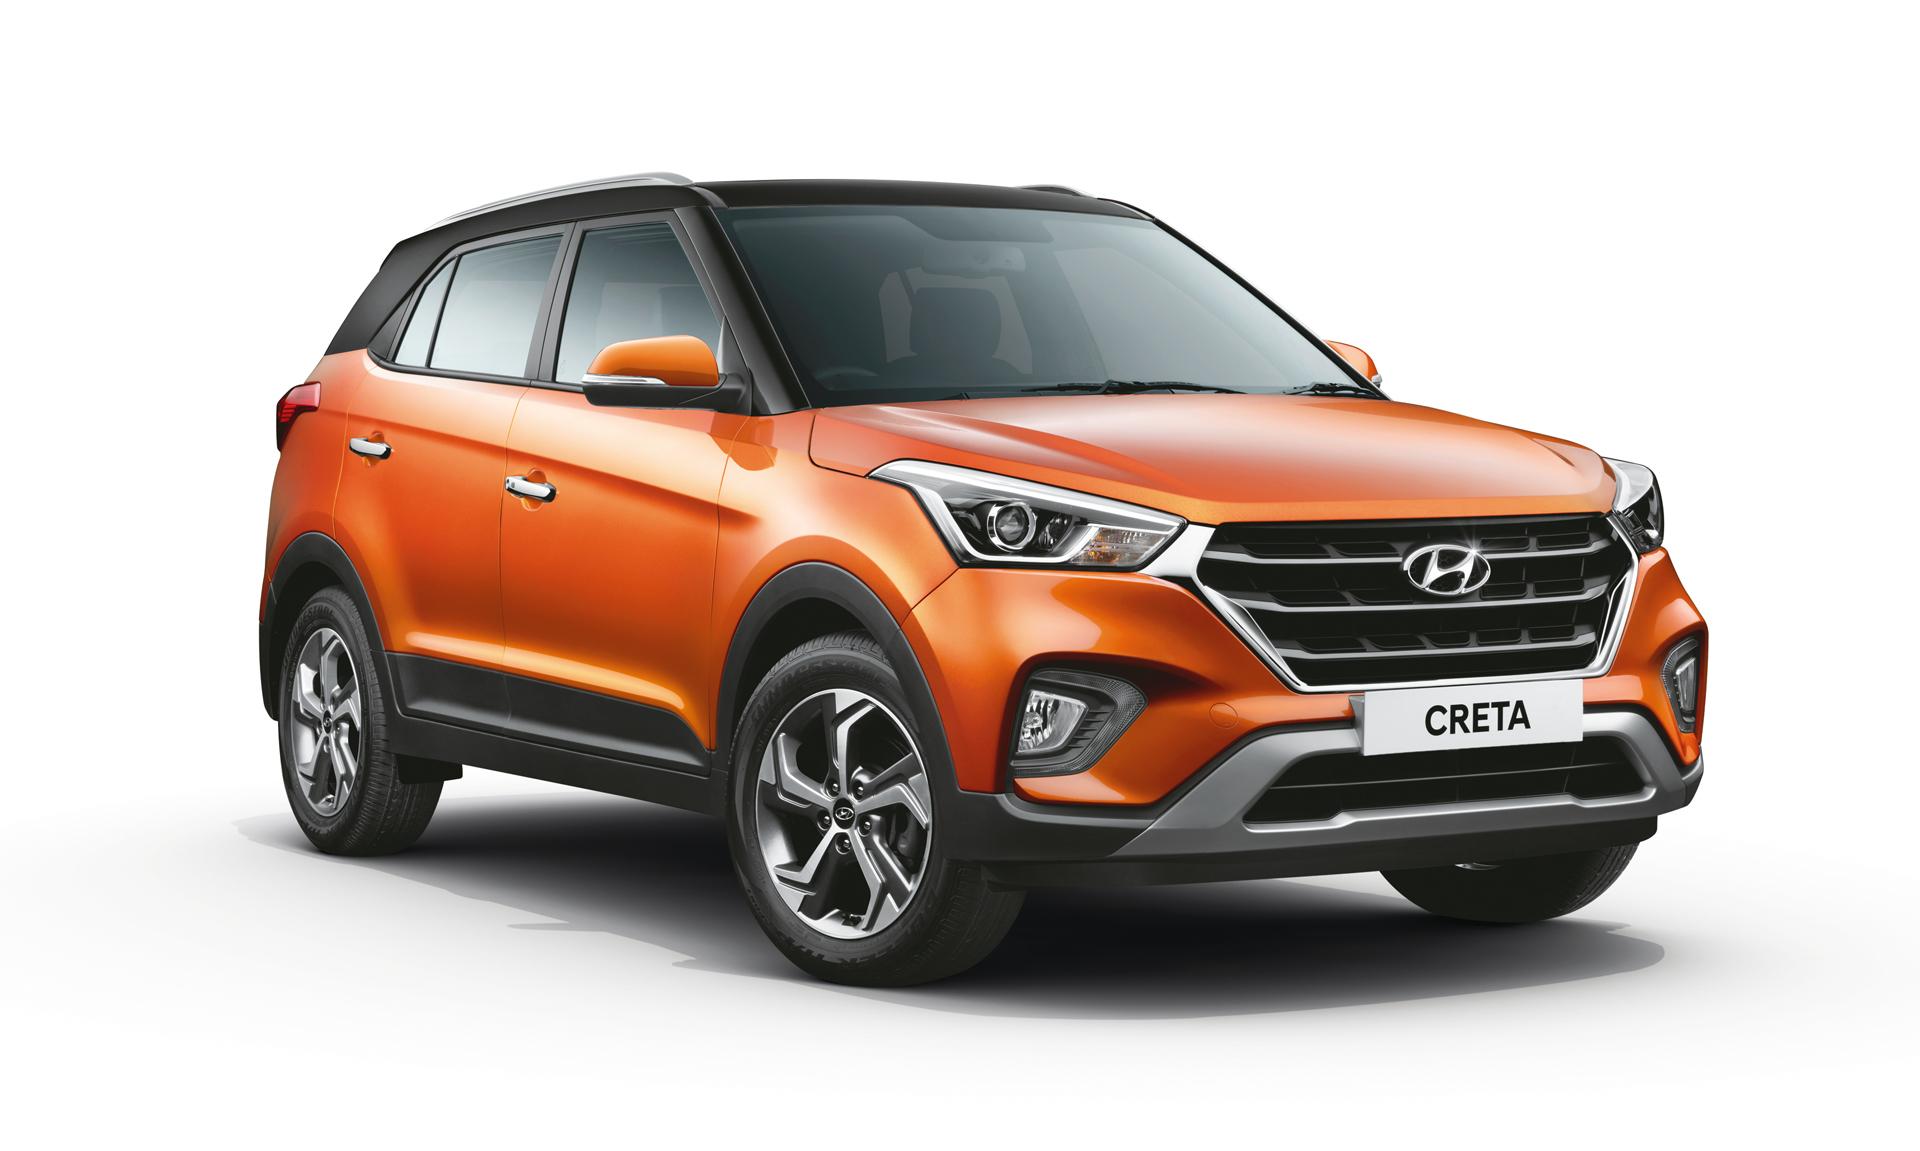 Hyundai Creta 2018 Sx 1 6 Crdi Photos Images And Wallpapers Colours Mouthshut Com